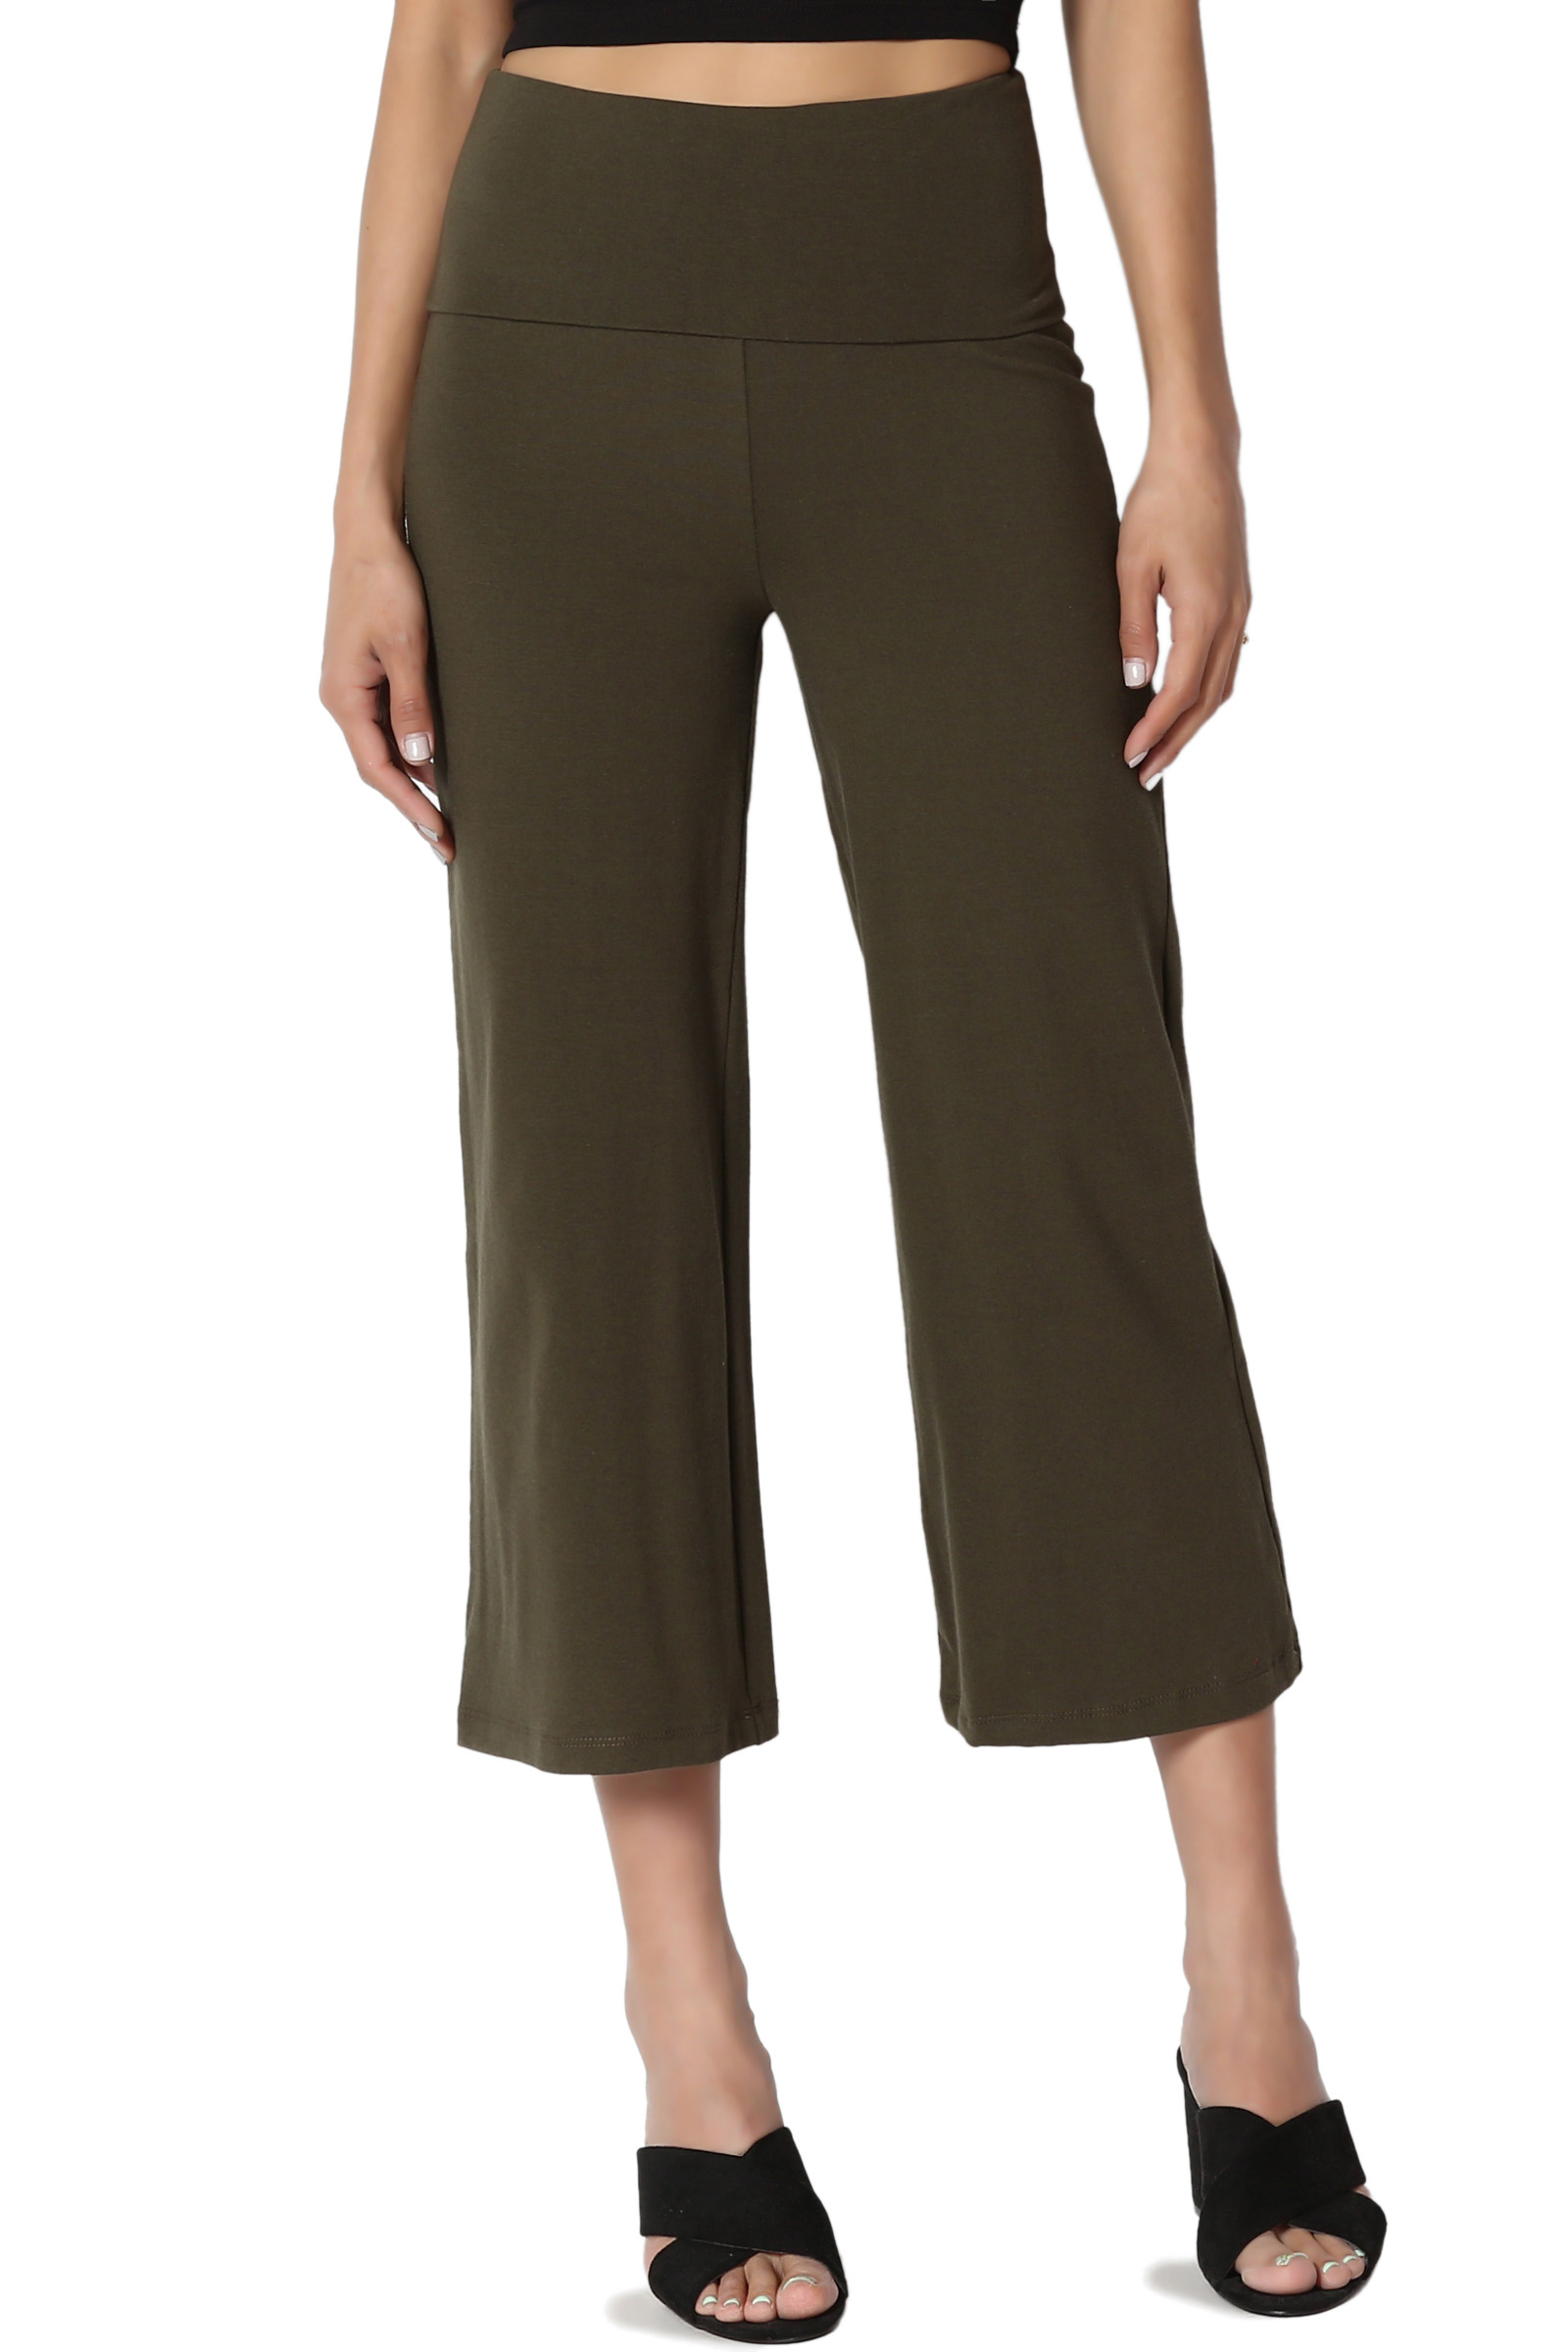 TheMogan Women's Foldover Wide Waistband Thick Stretch Cotton Crop Capri Yoga Pants